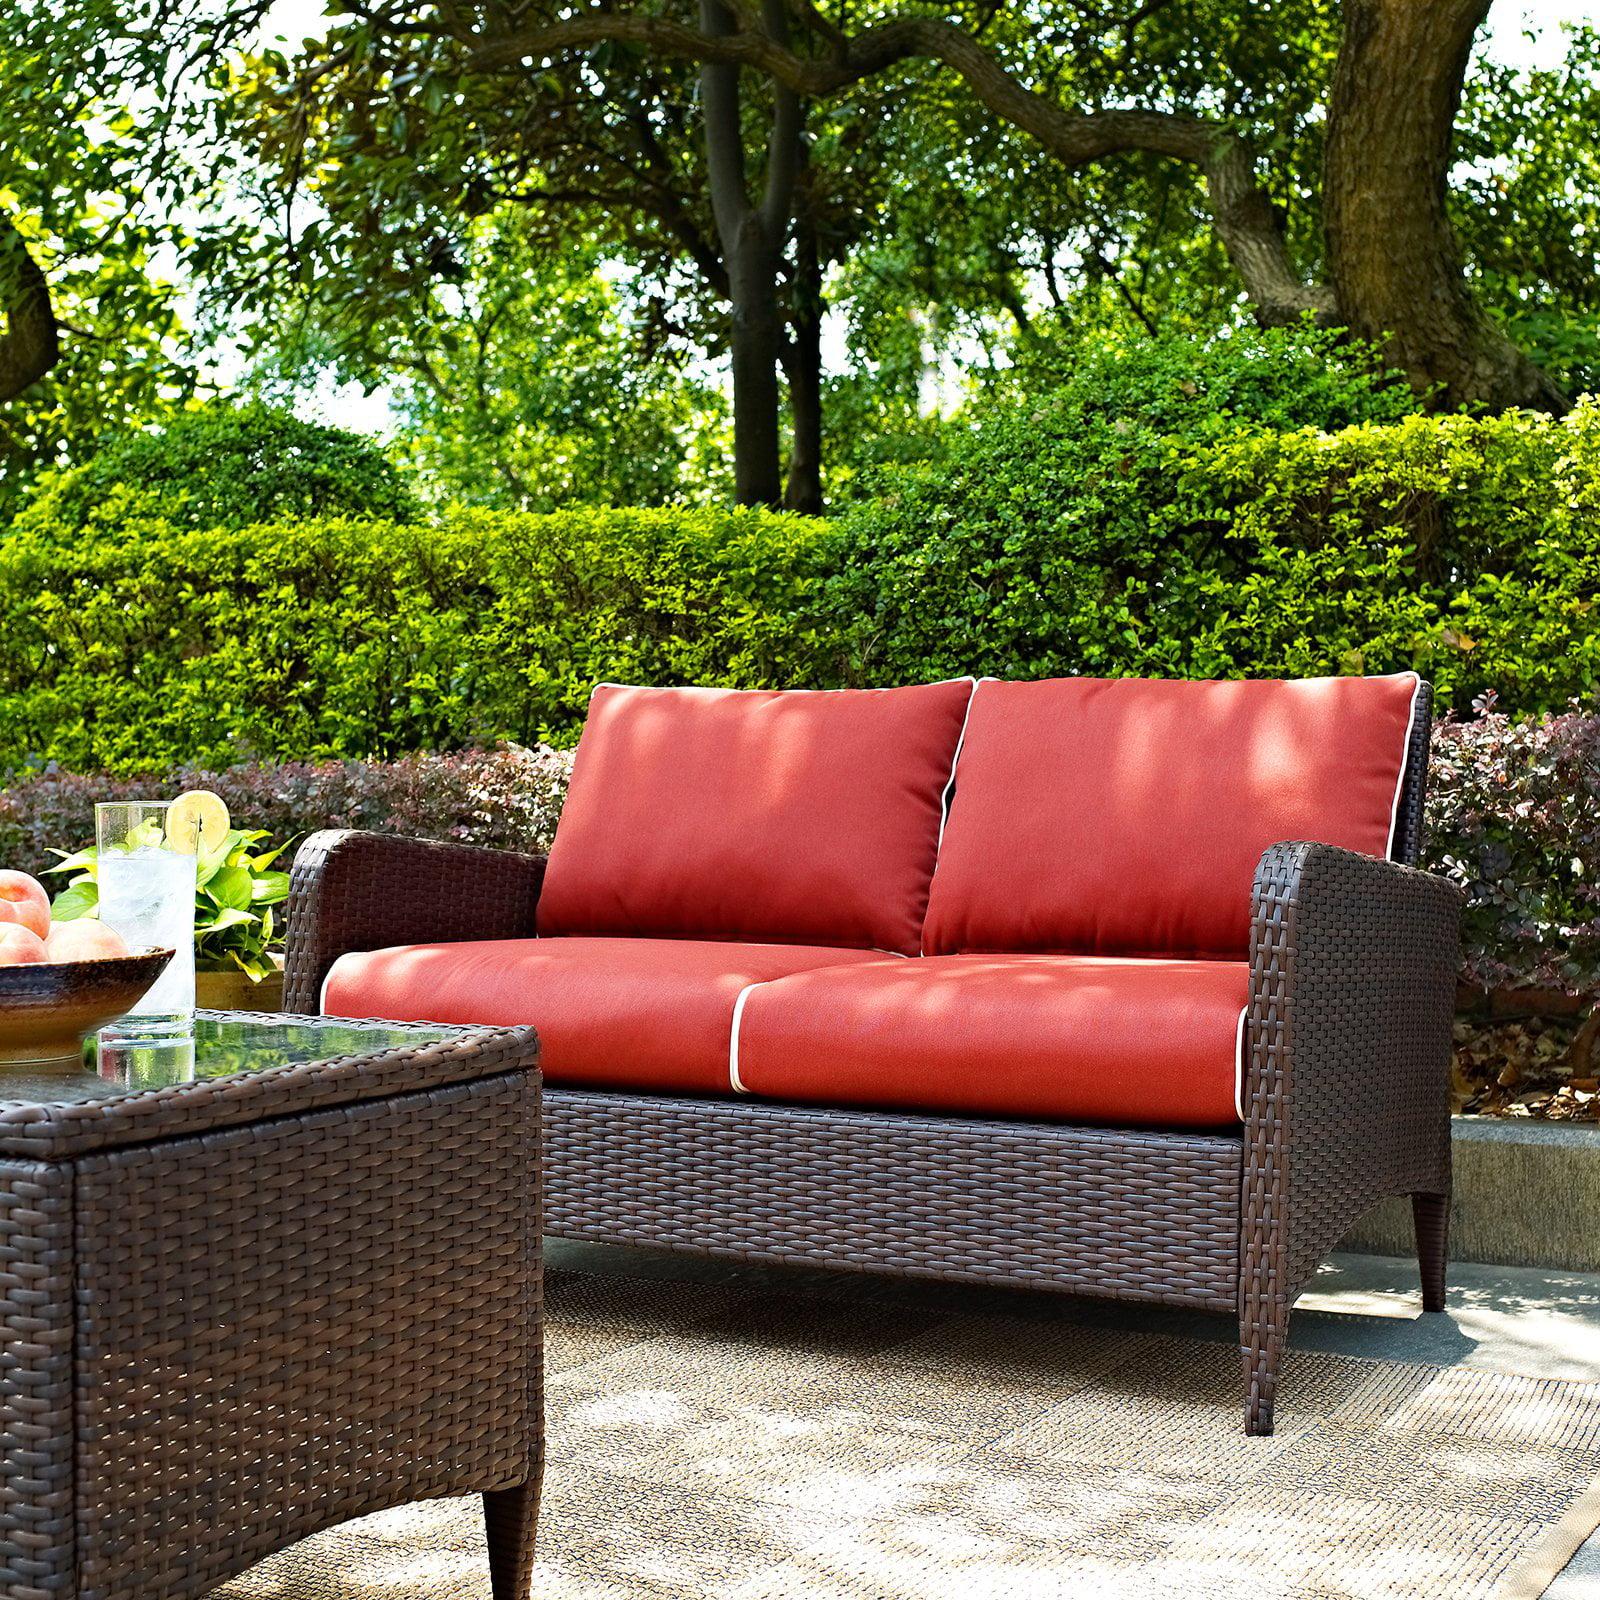 Crosley Furniture Kiawah Outdoor Wicker Loveseat with Sangria Cushions